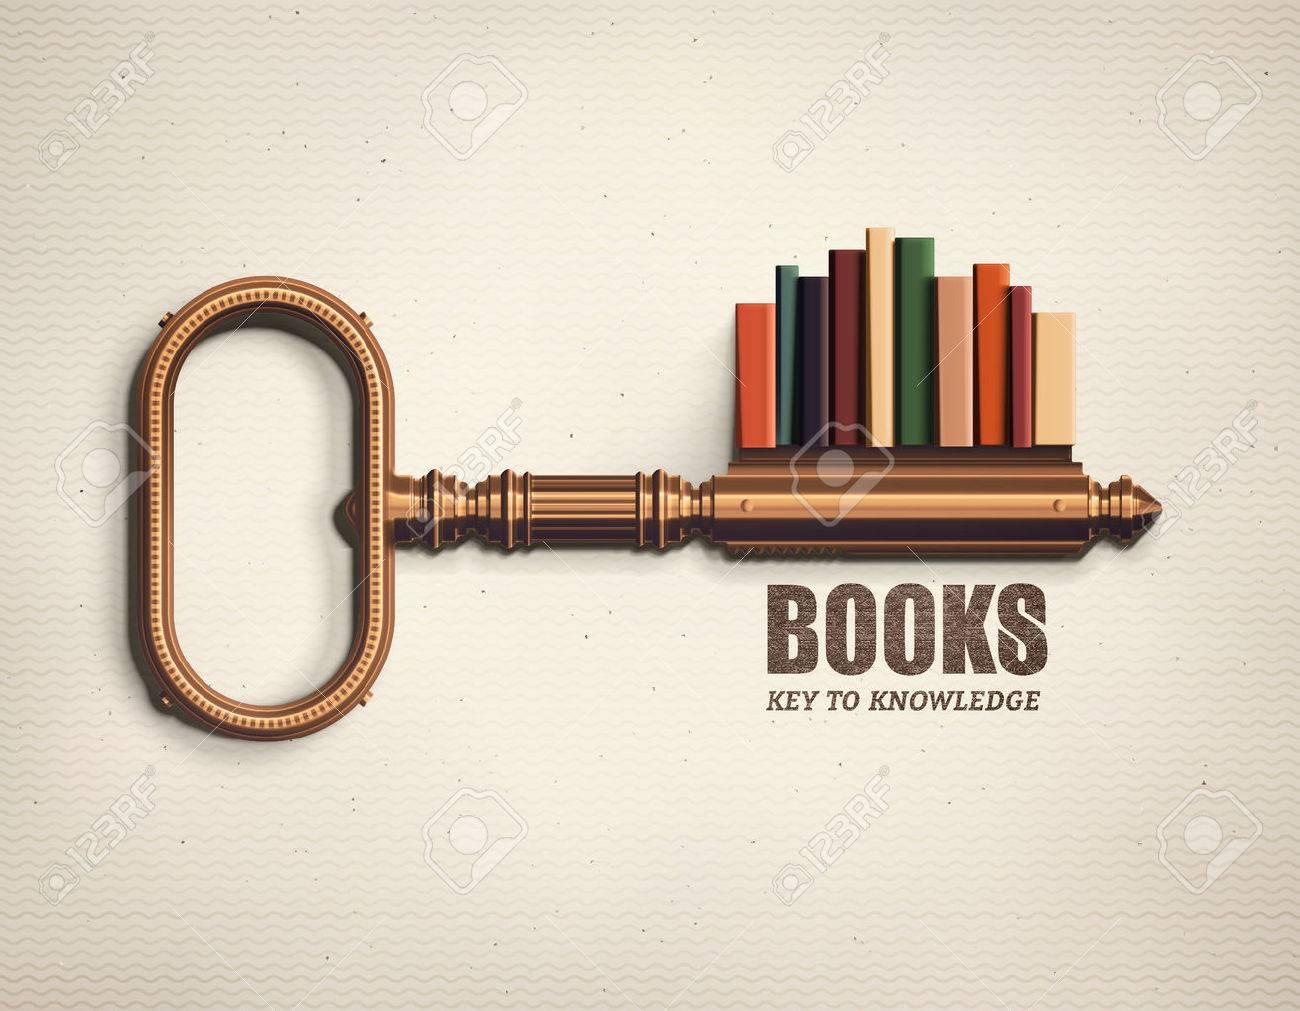 Books, key to knowledge Standard-Bild - 51363666